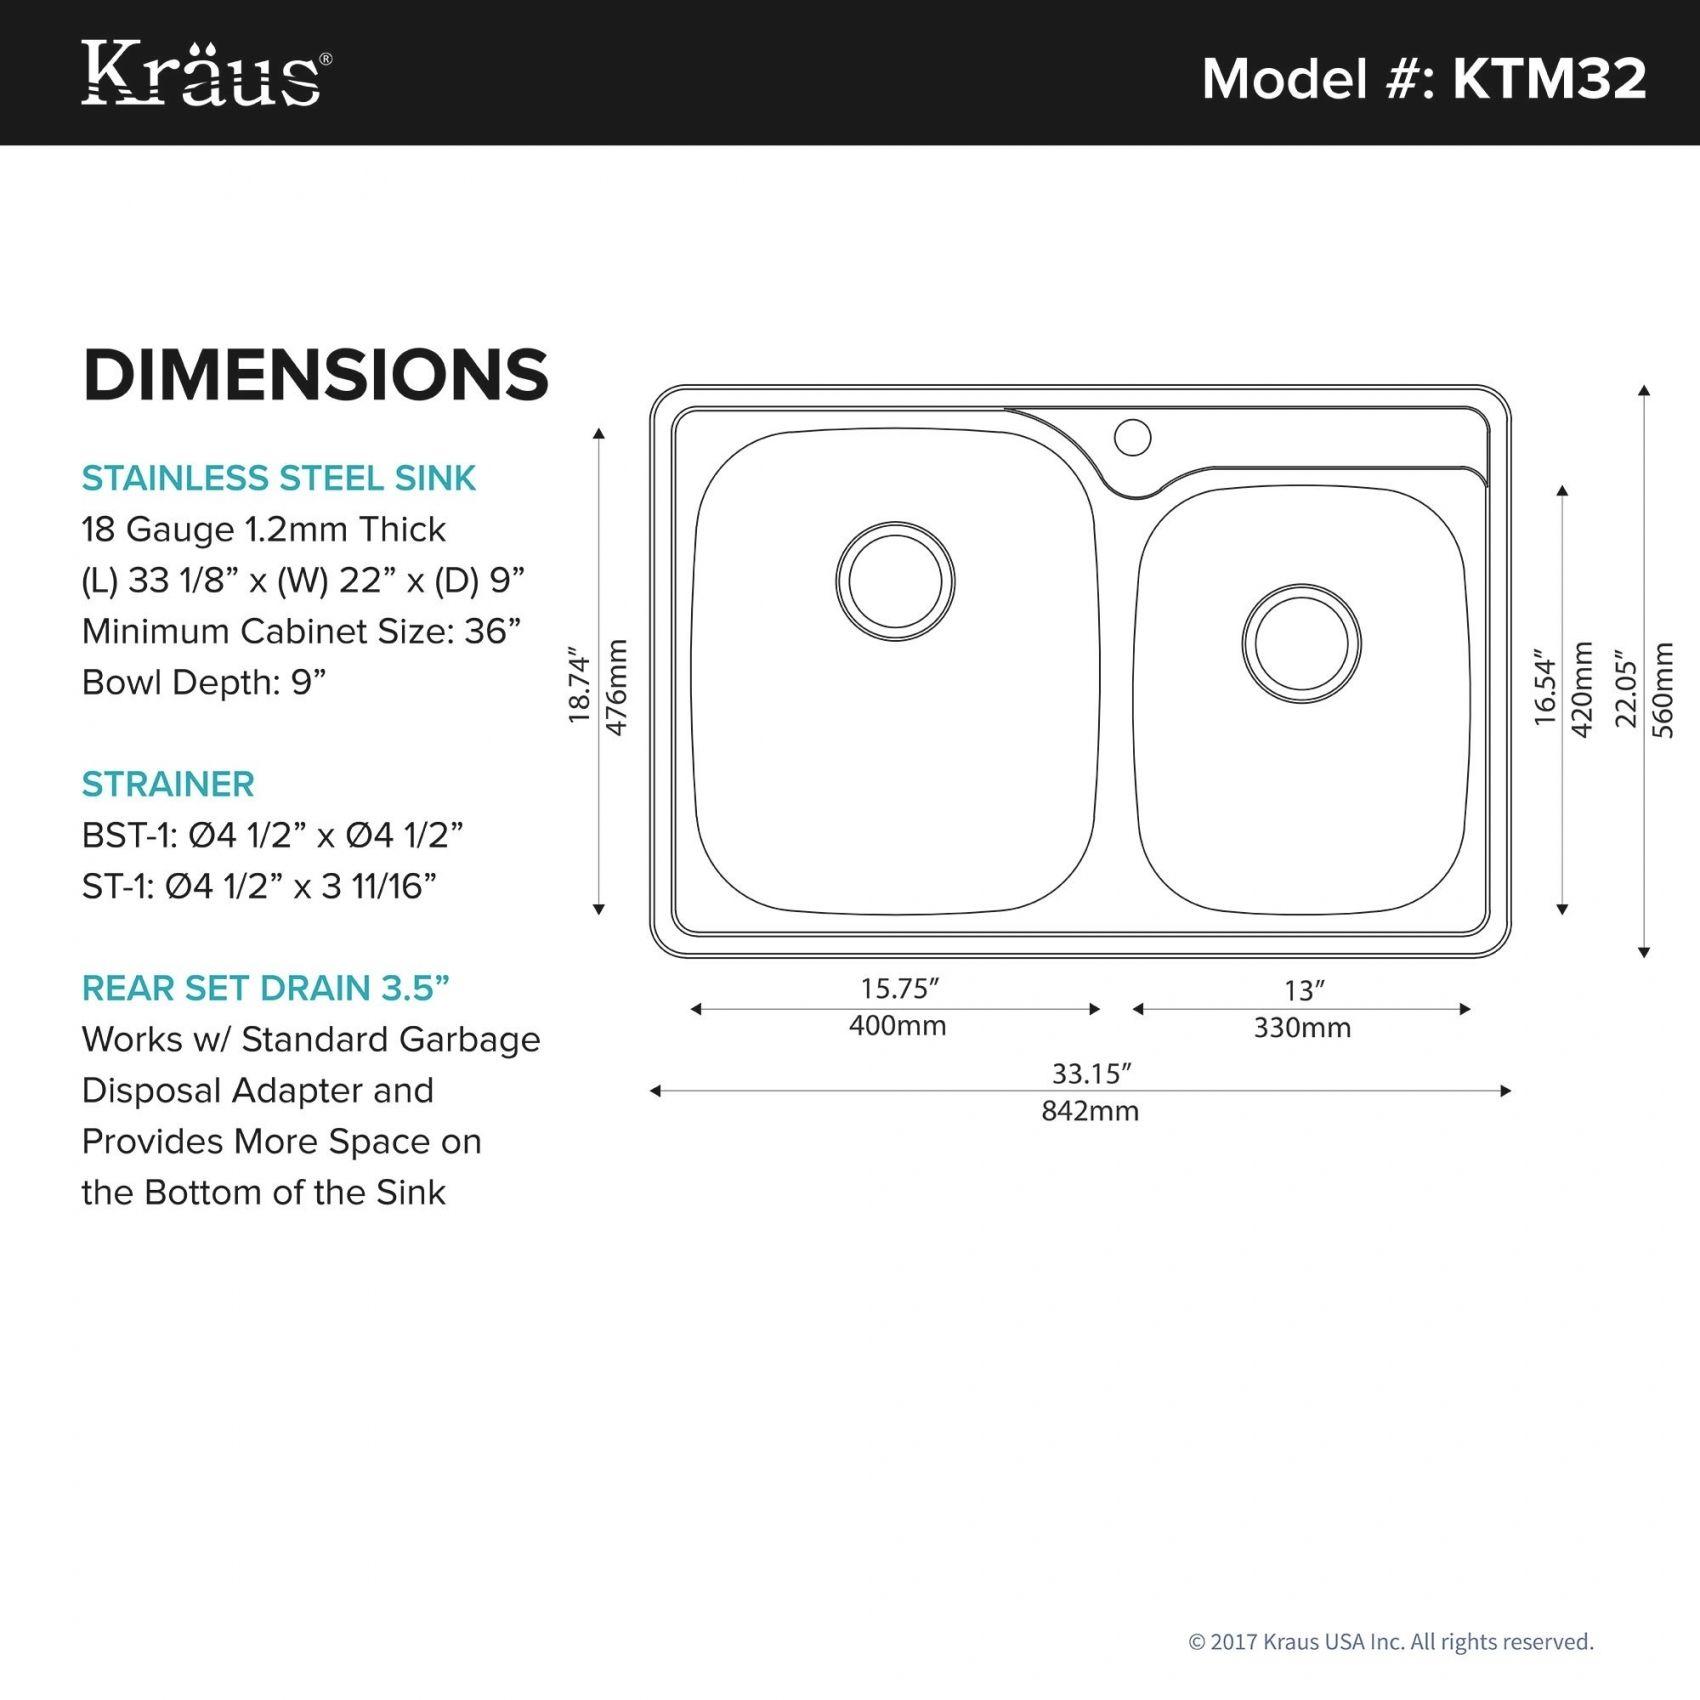 Kitchen Sink Dimensions In Inches Https Festivalmontmelas Com P 33076 Kitchen Sink Sink Kitchen Sink Sizes